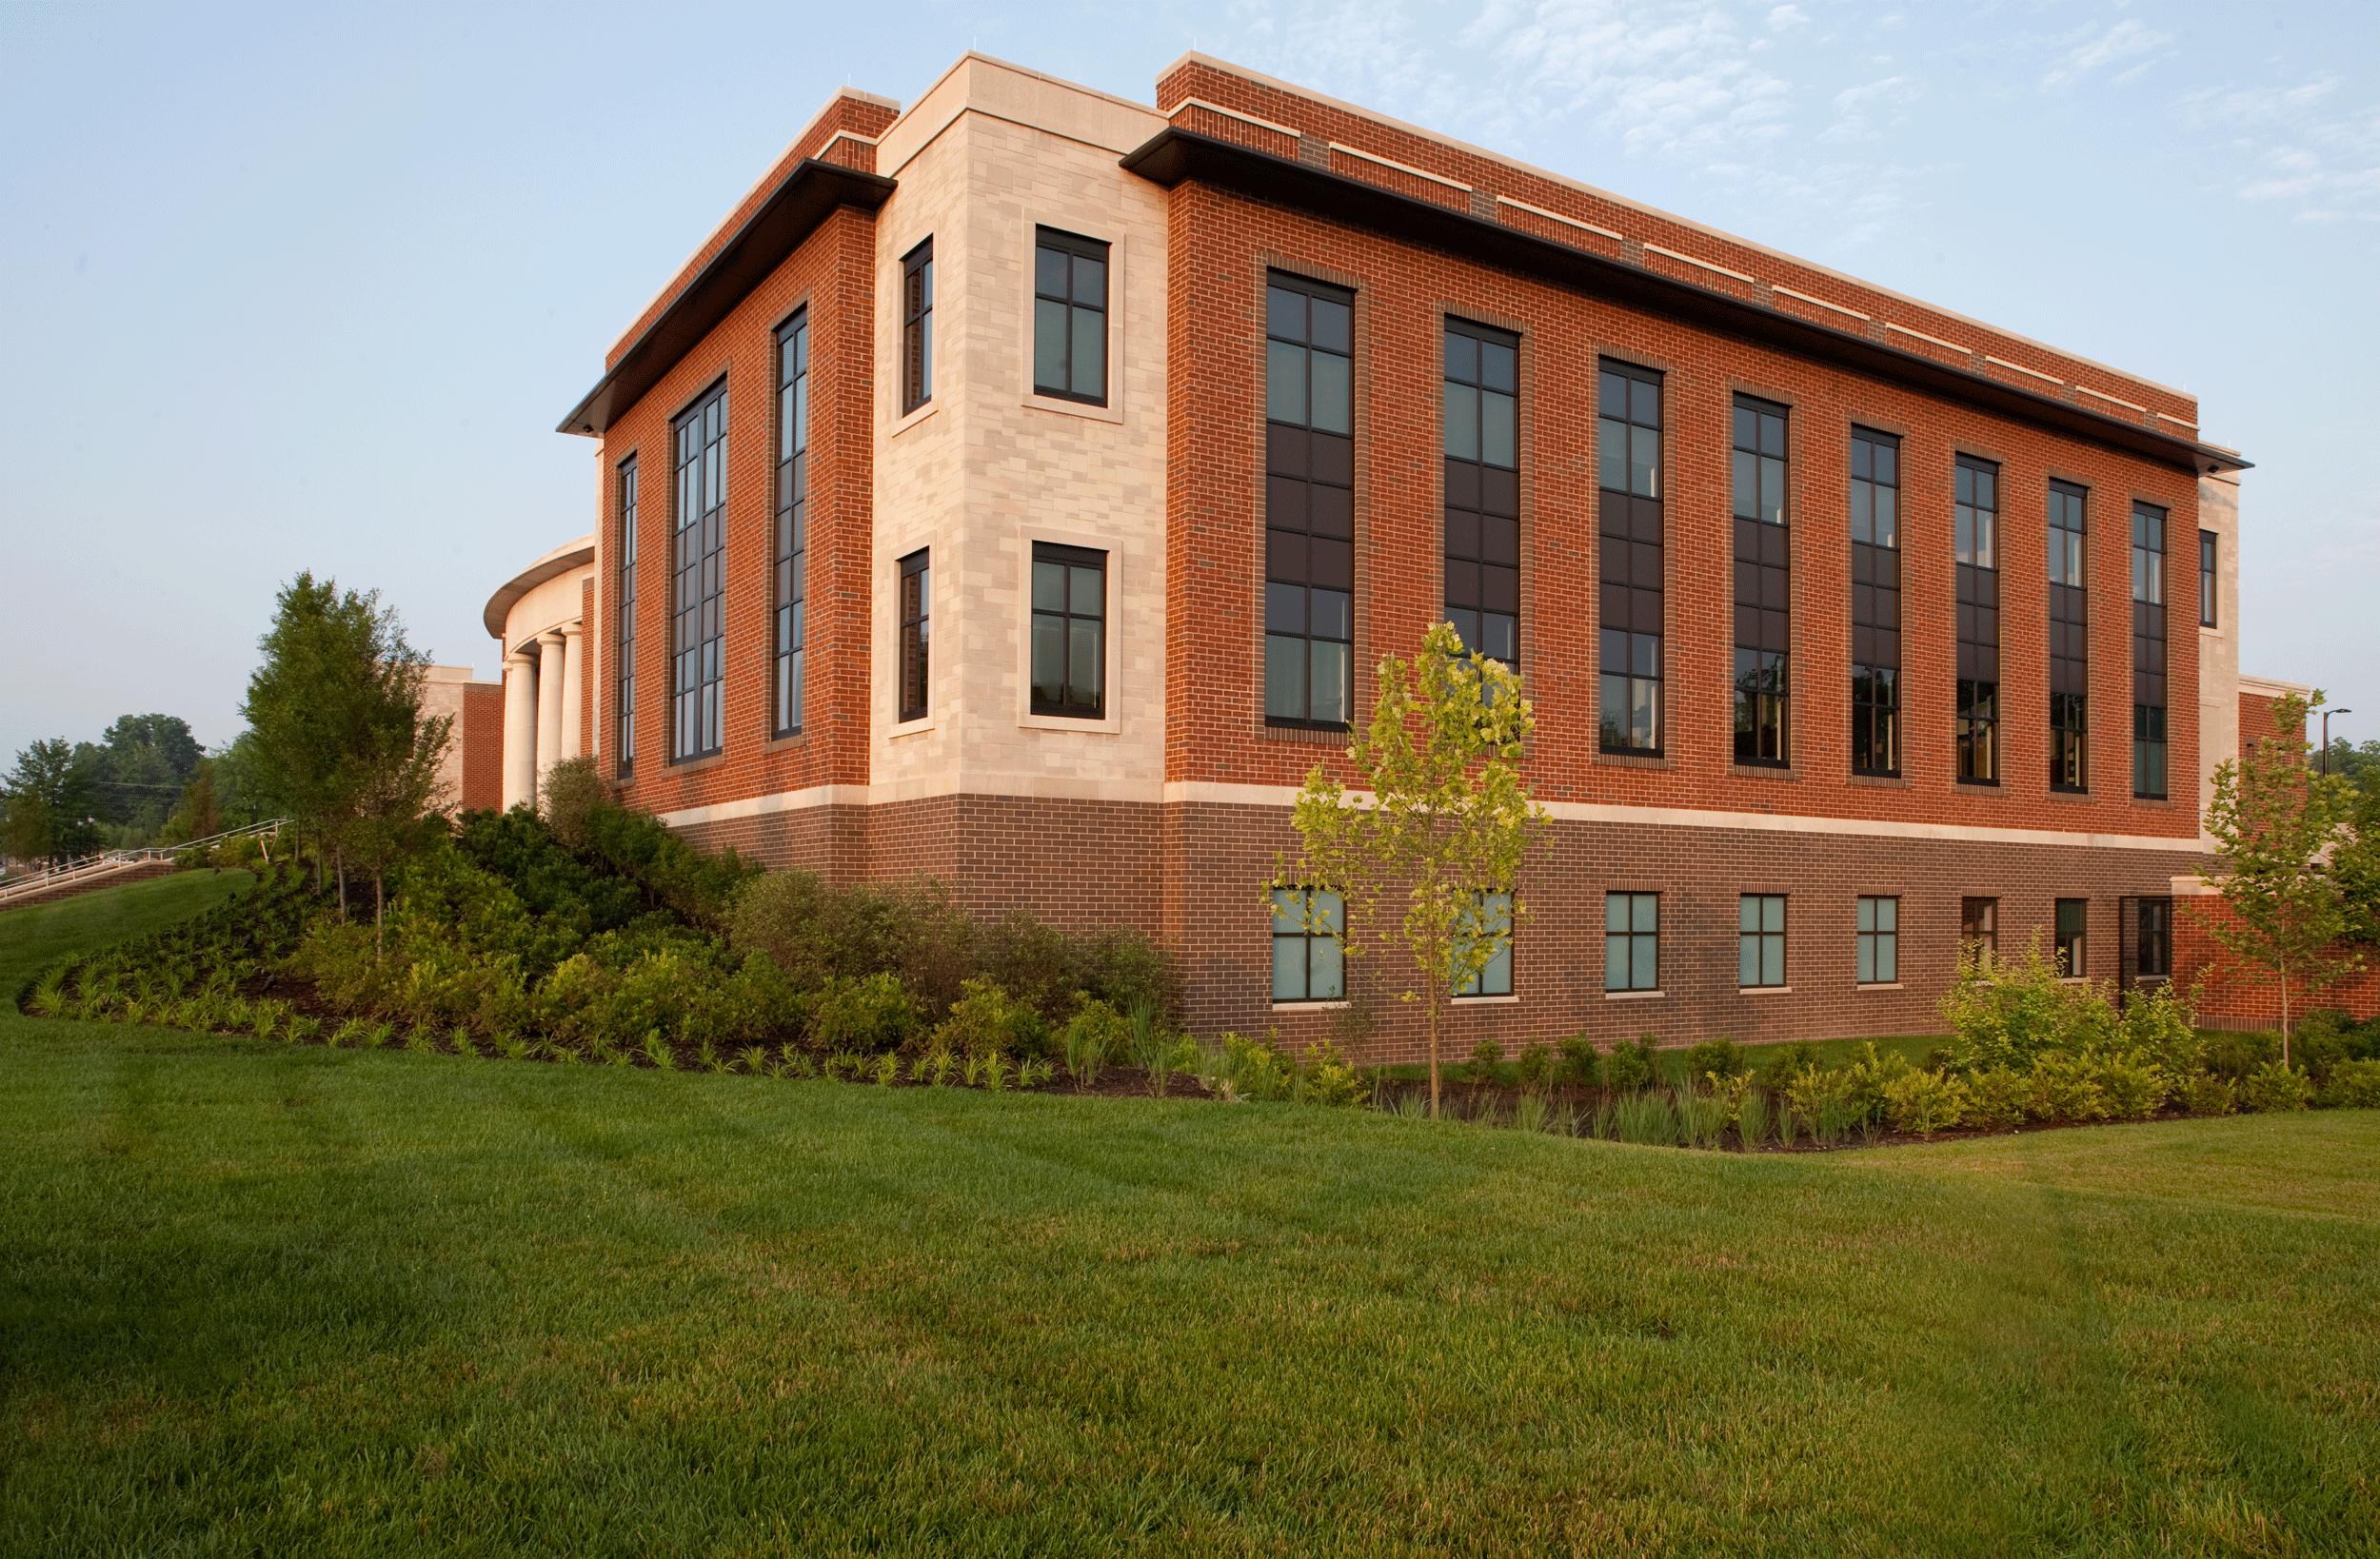 exterior side detail